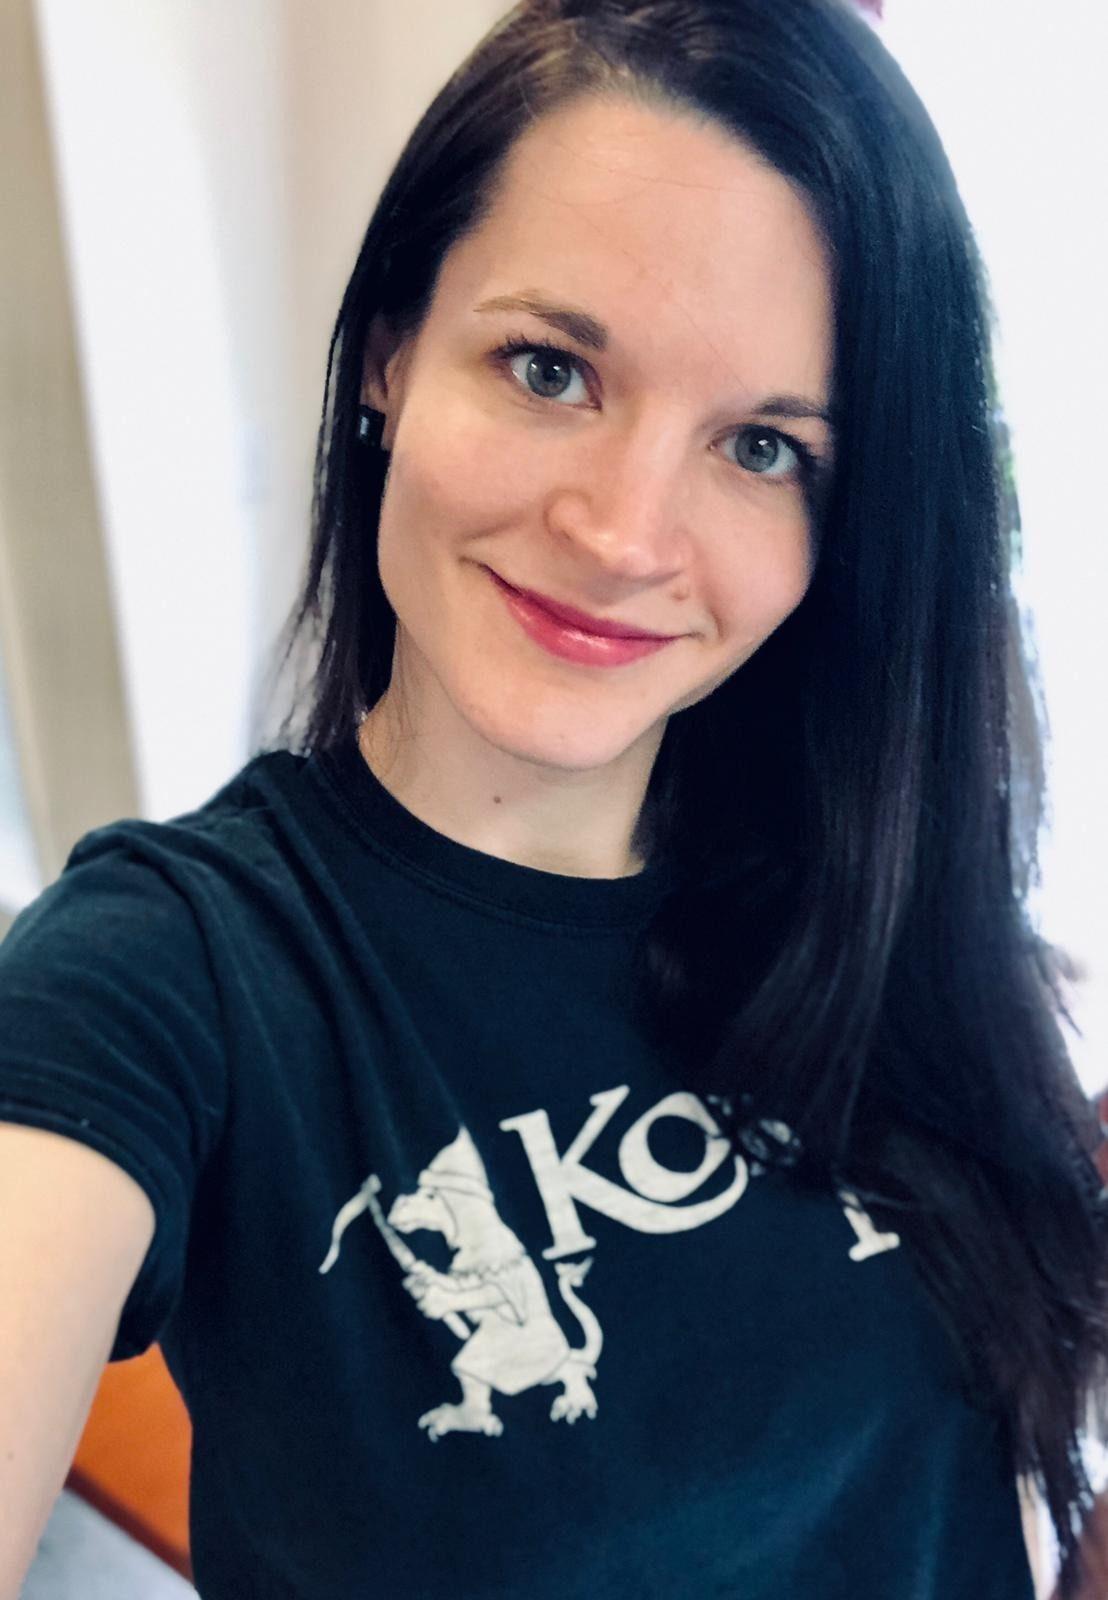 Hiring Update: A Kobold Comes Home